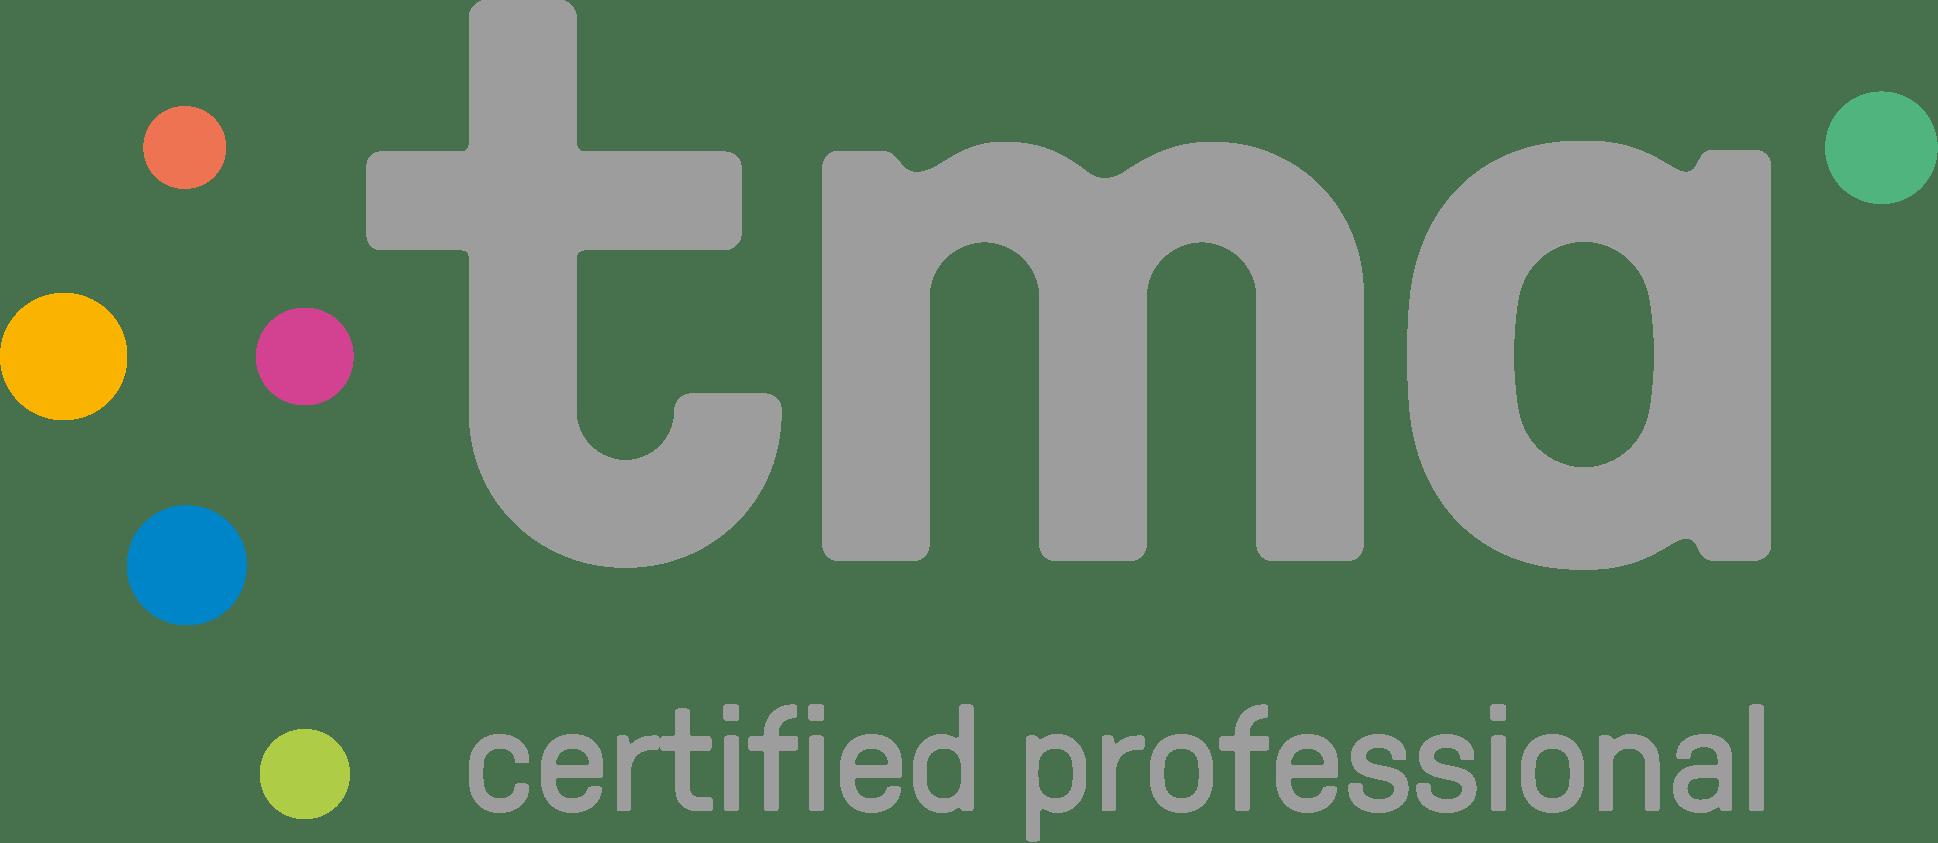 TMA Certified professional